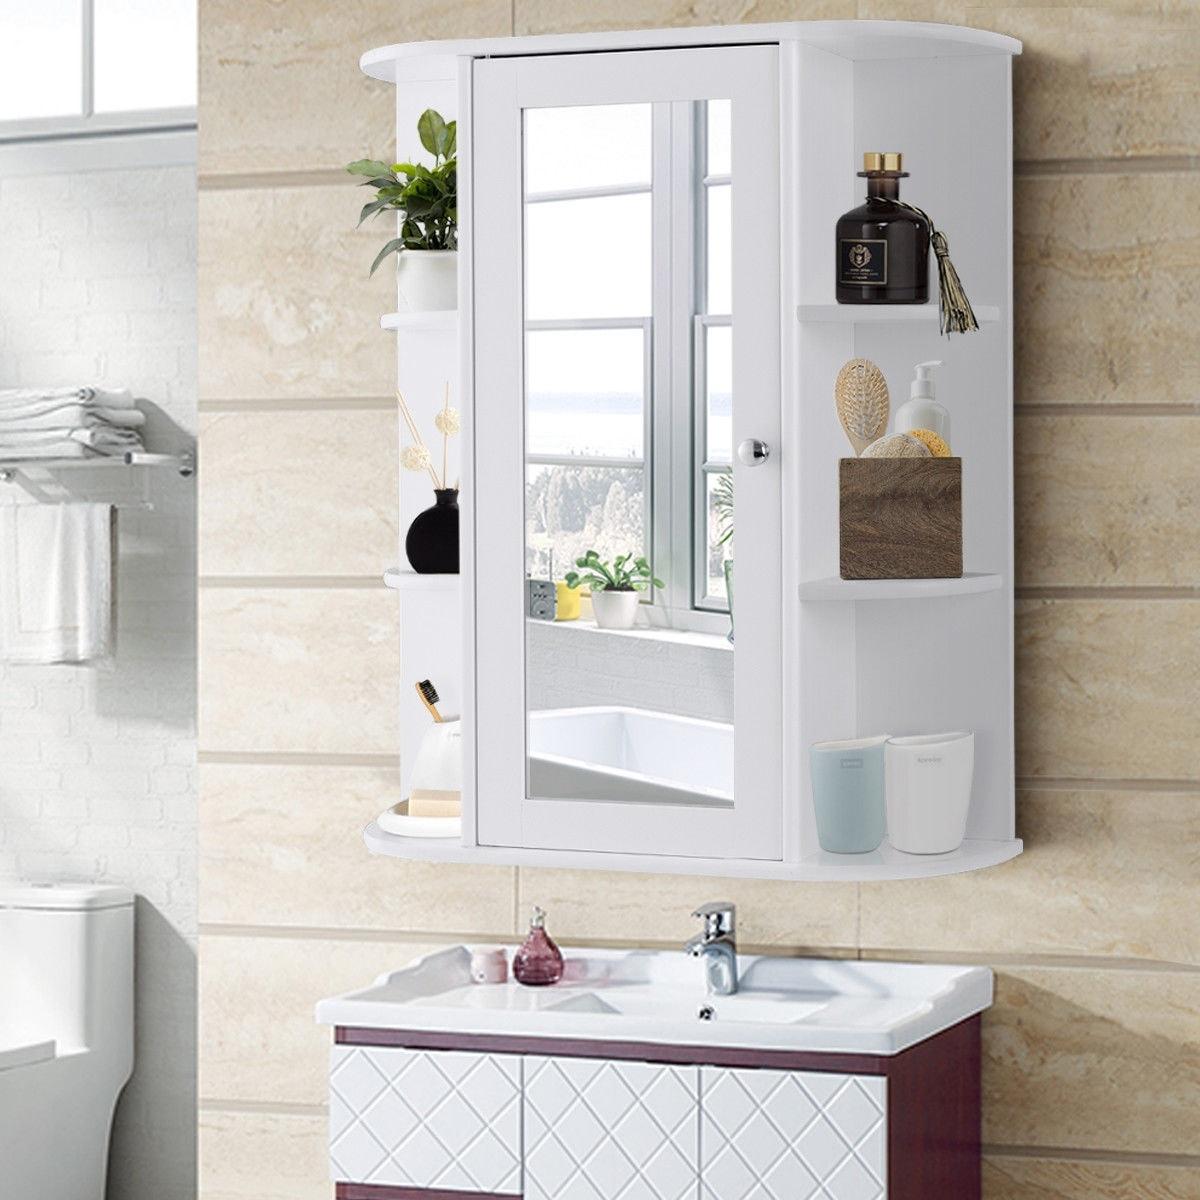 Gymax Bathroom Cabinet Single Door Shelves Wall Mount W Mirror Organizer